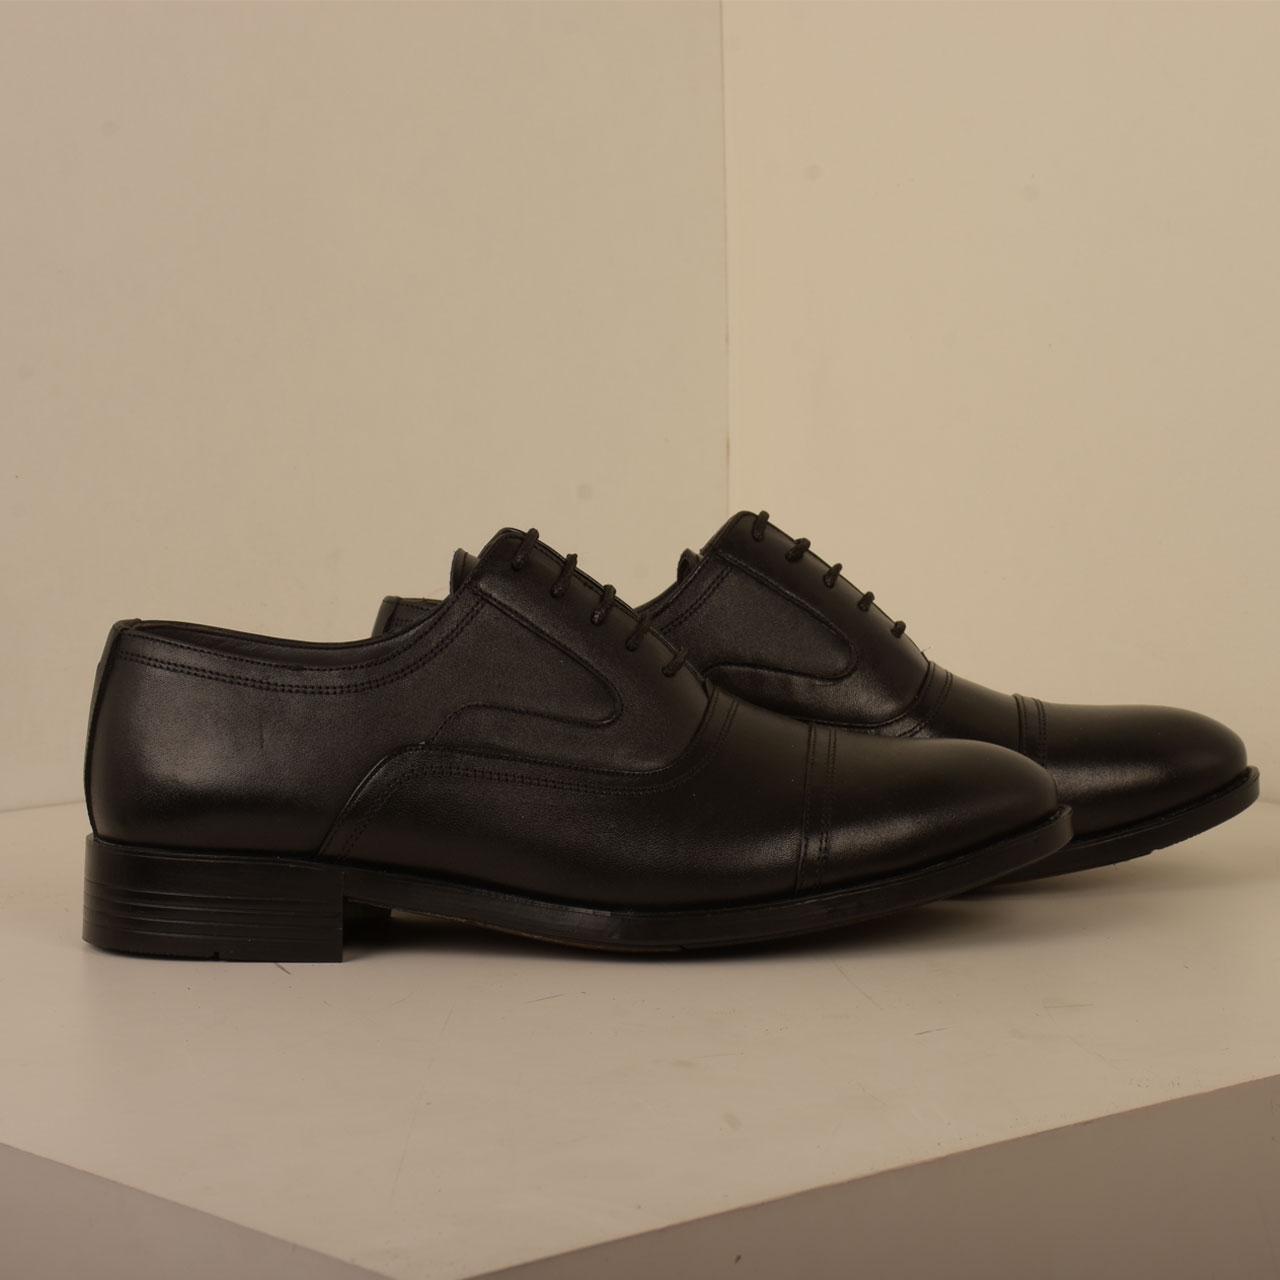 کفش مردانه پارینه چرم مدل SHO178 -  - 2